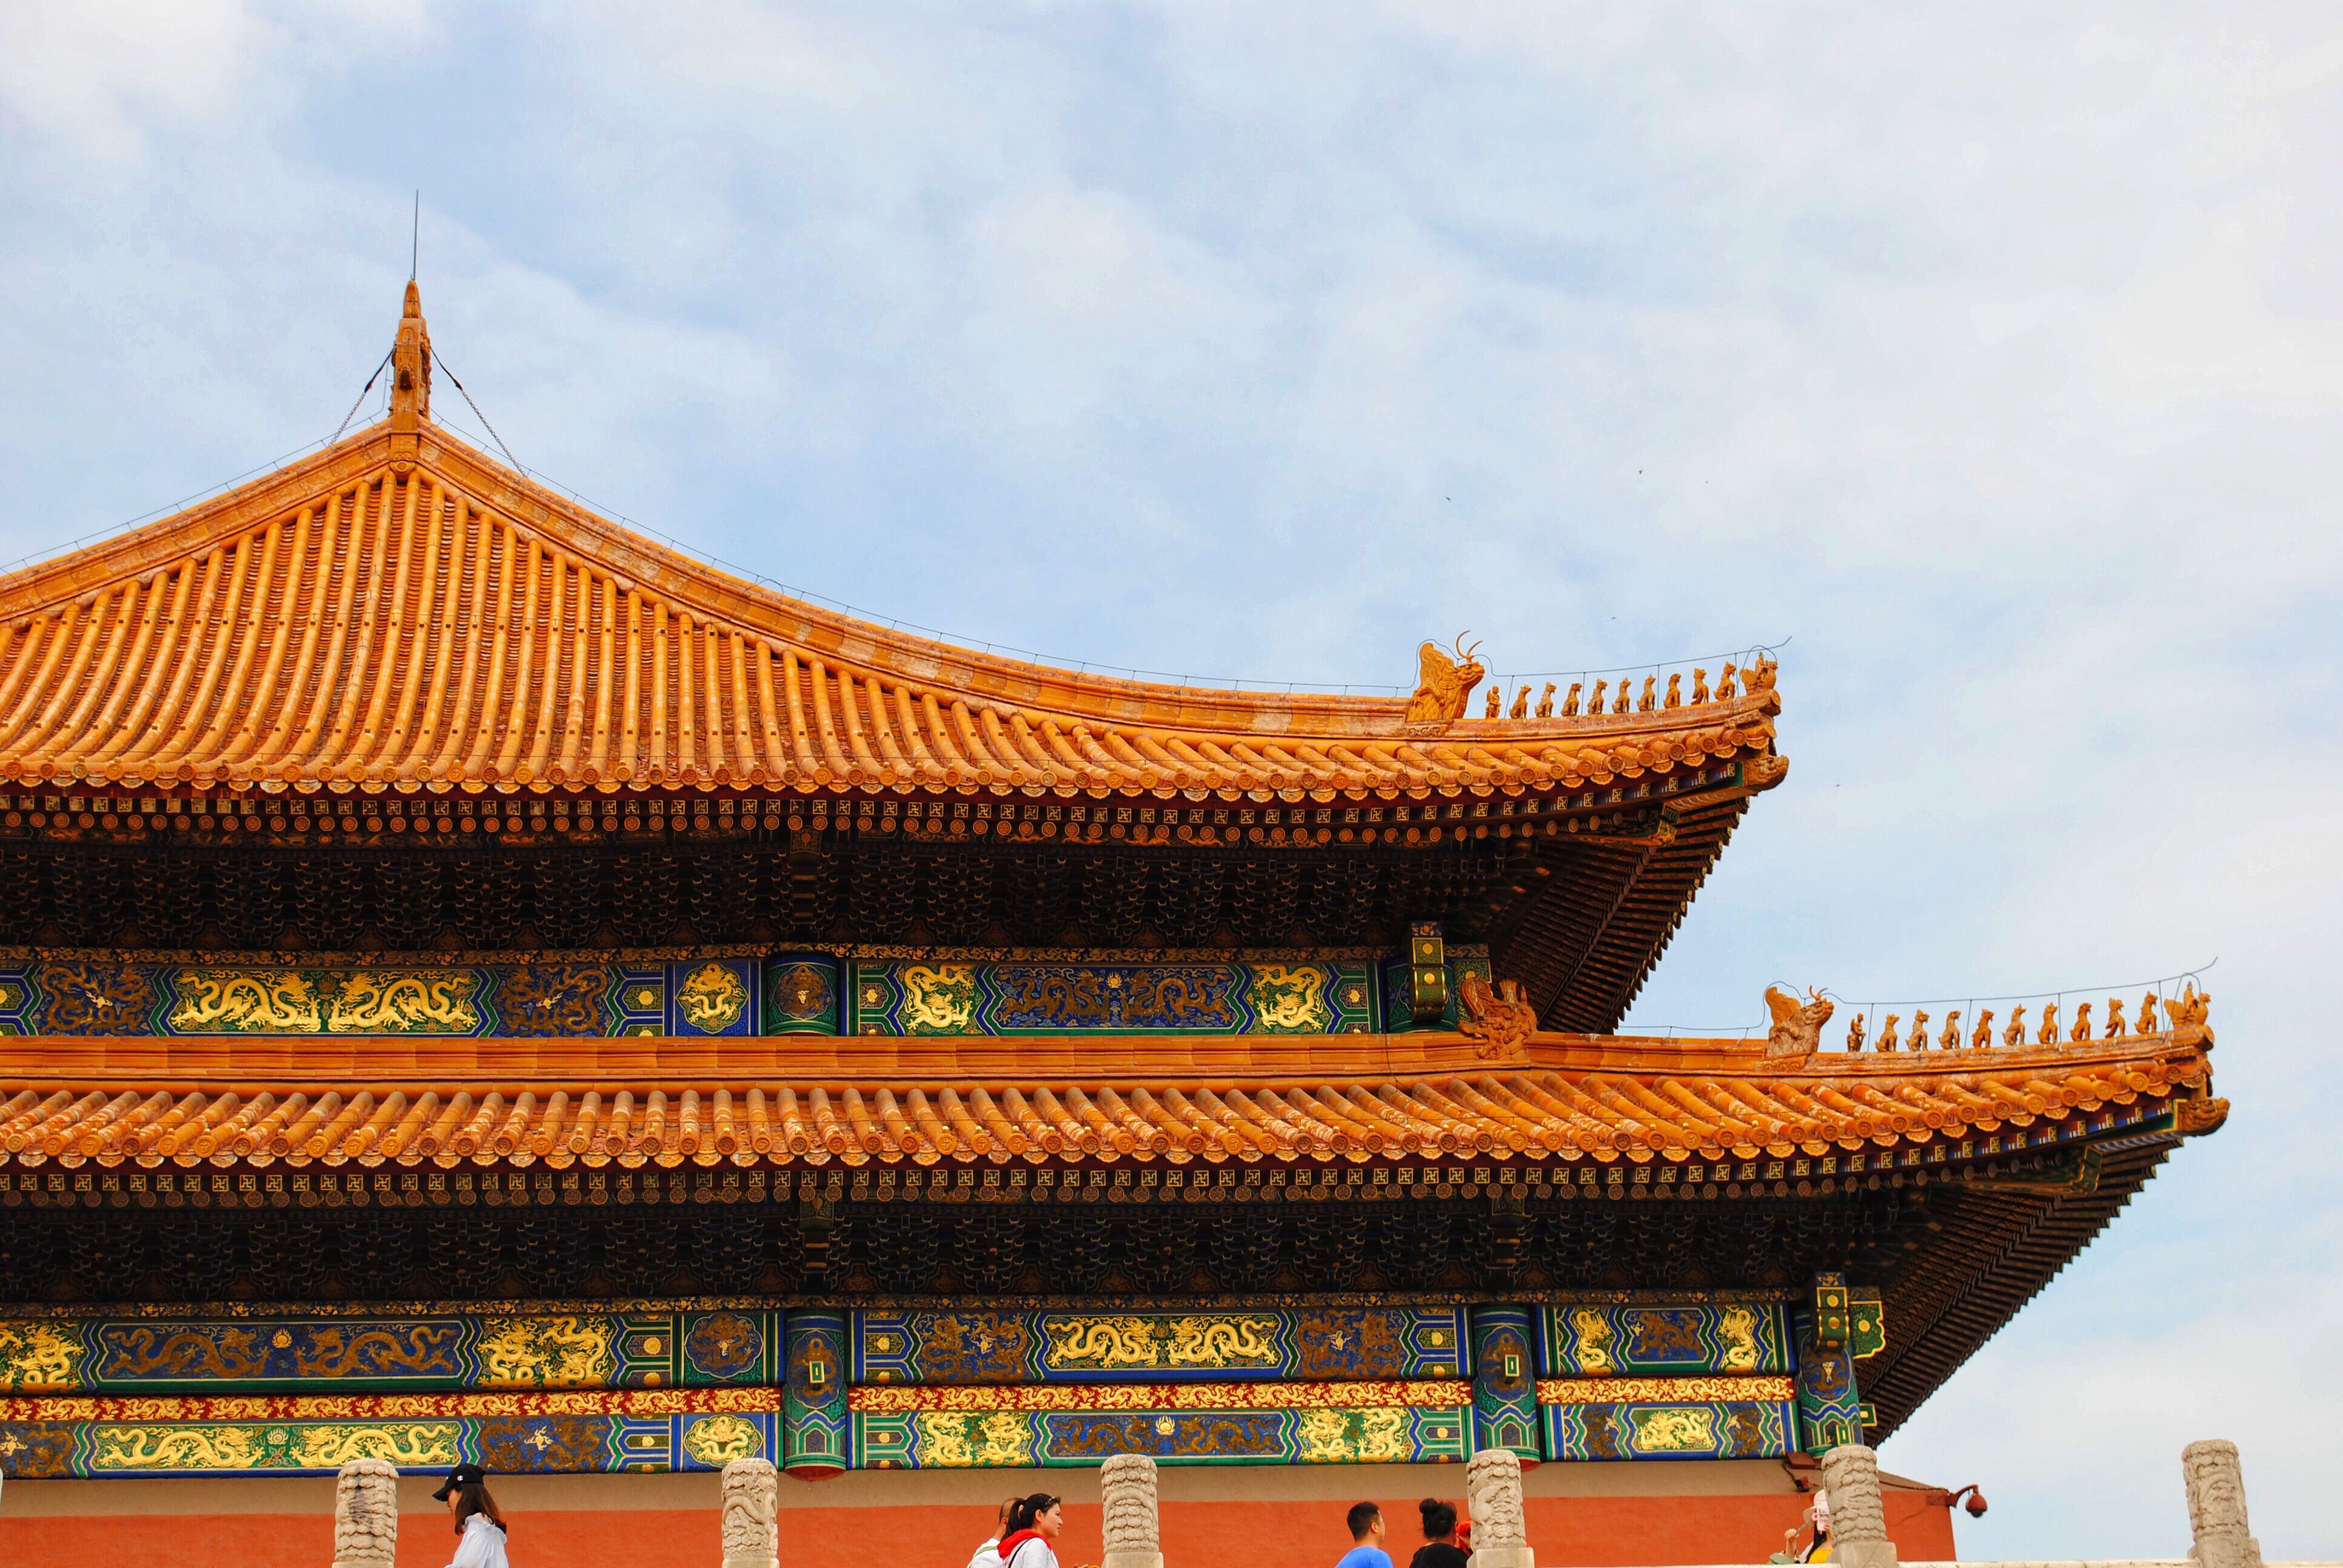 863 The Forbidden City Beijing China Forbidden City Beijing China